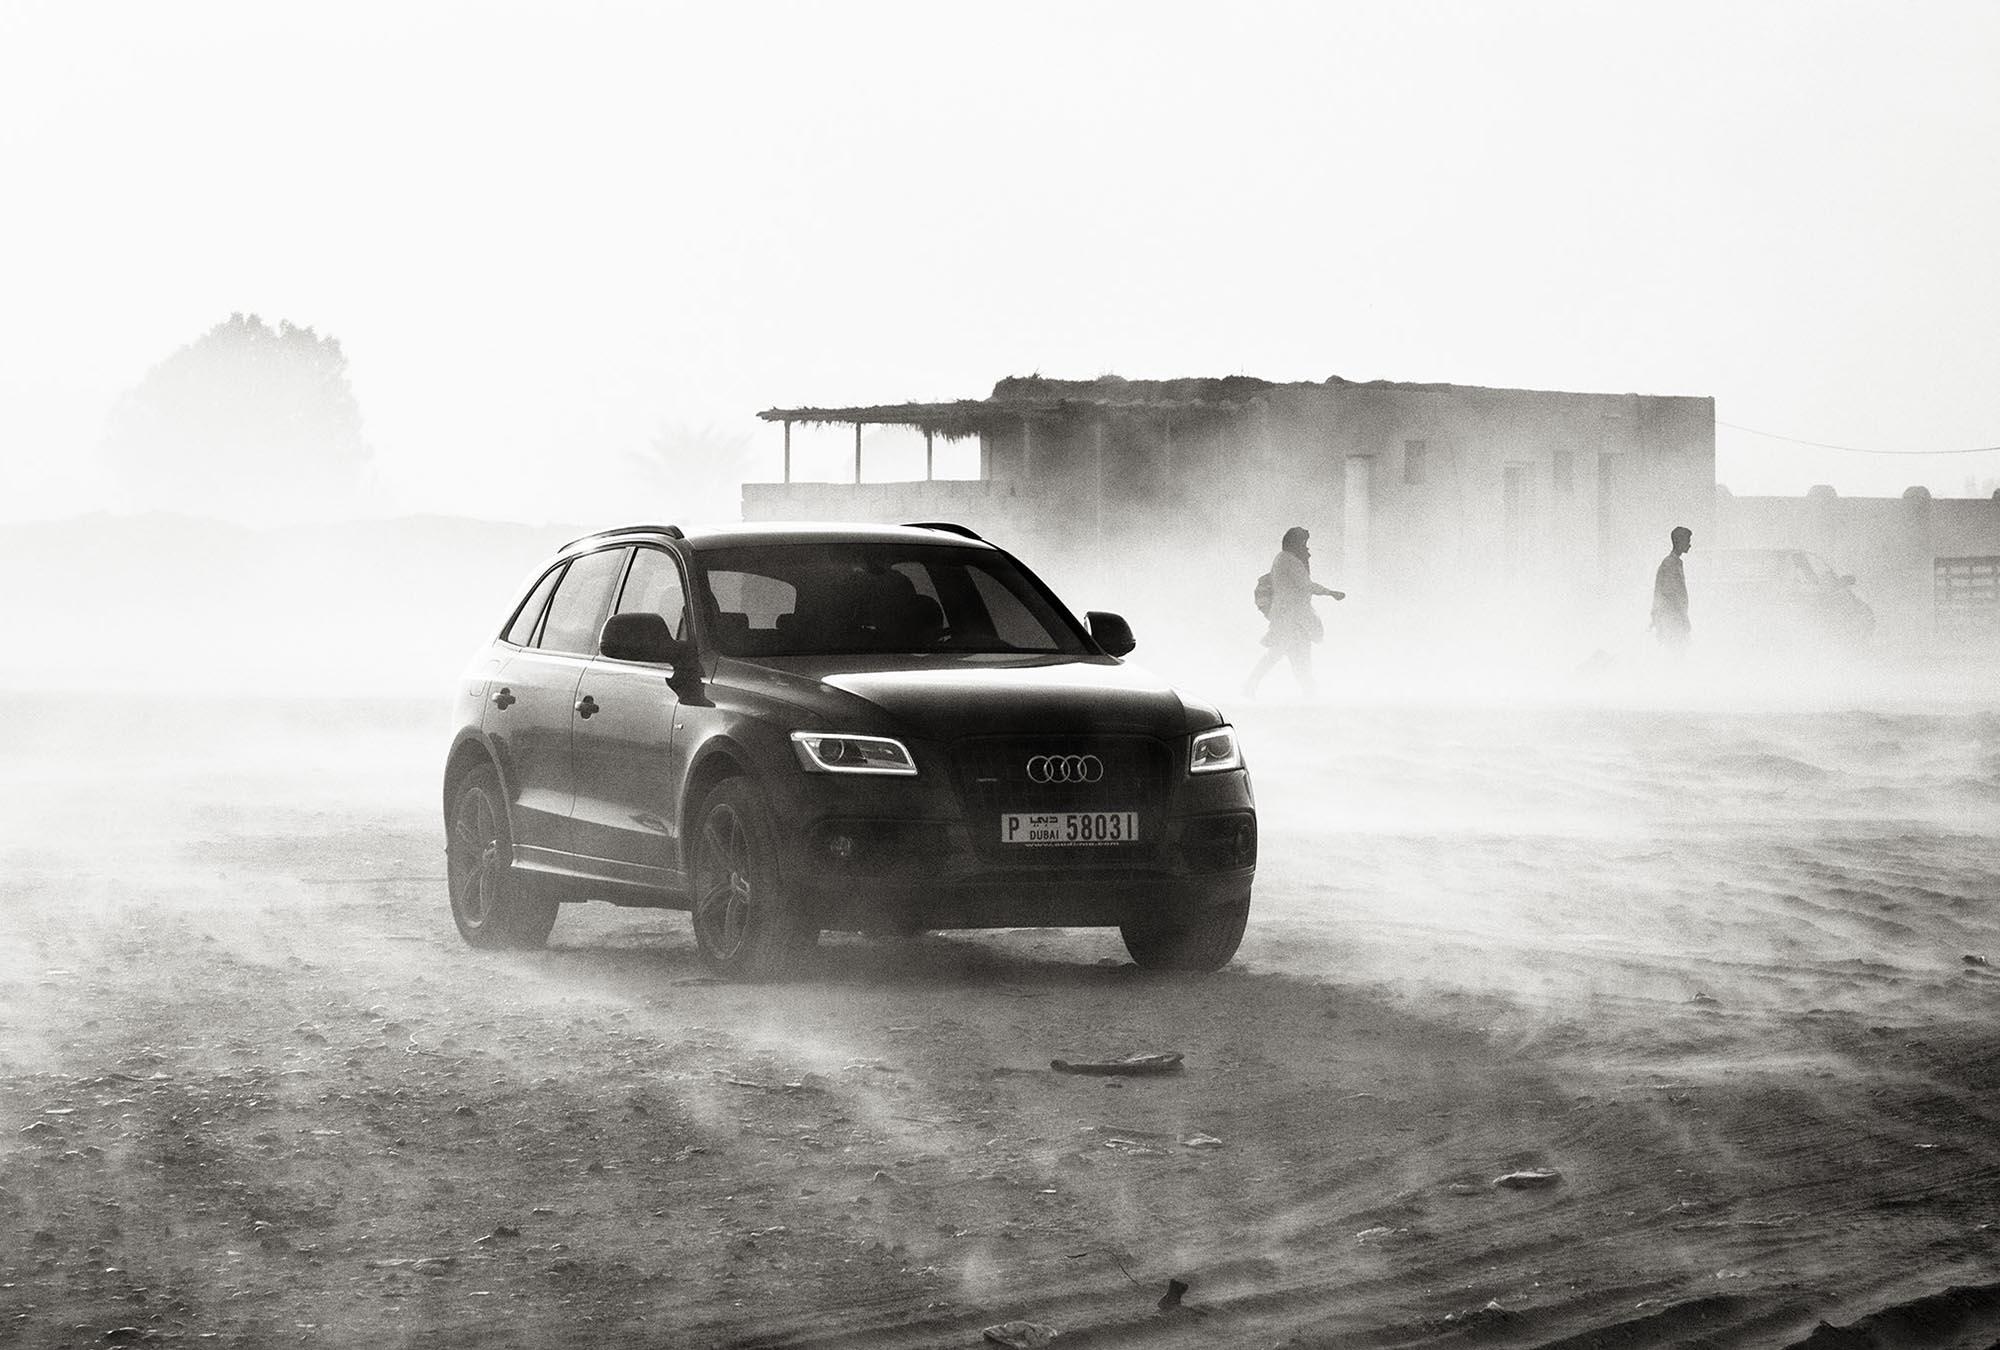 Dubai Photographer Duncan Chard- Audi in a sandstorm